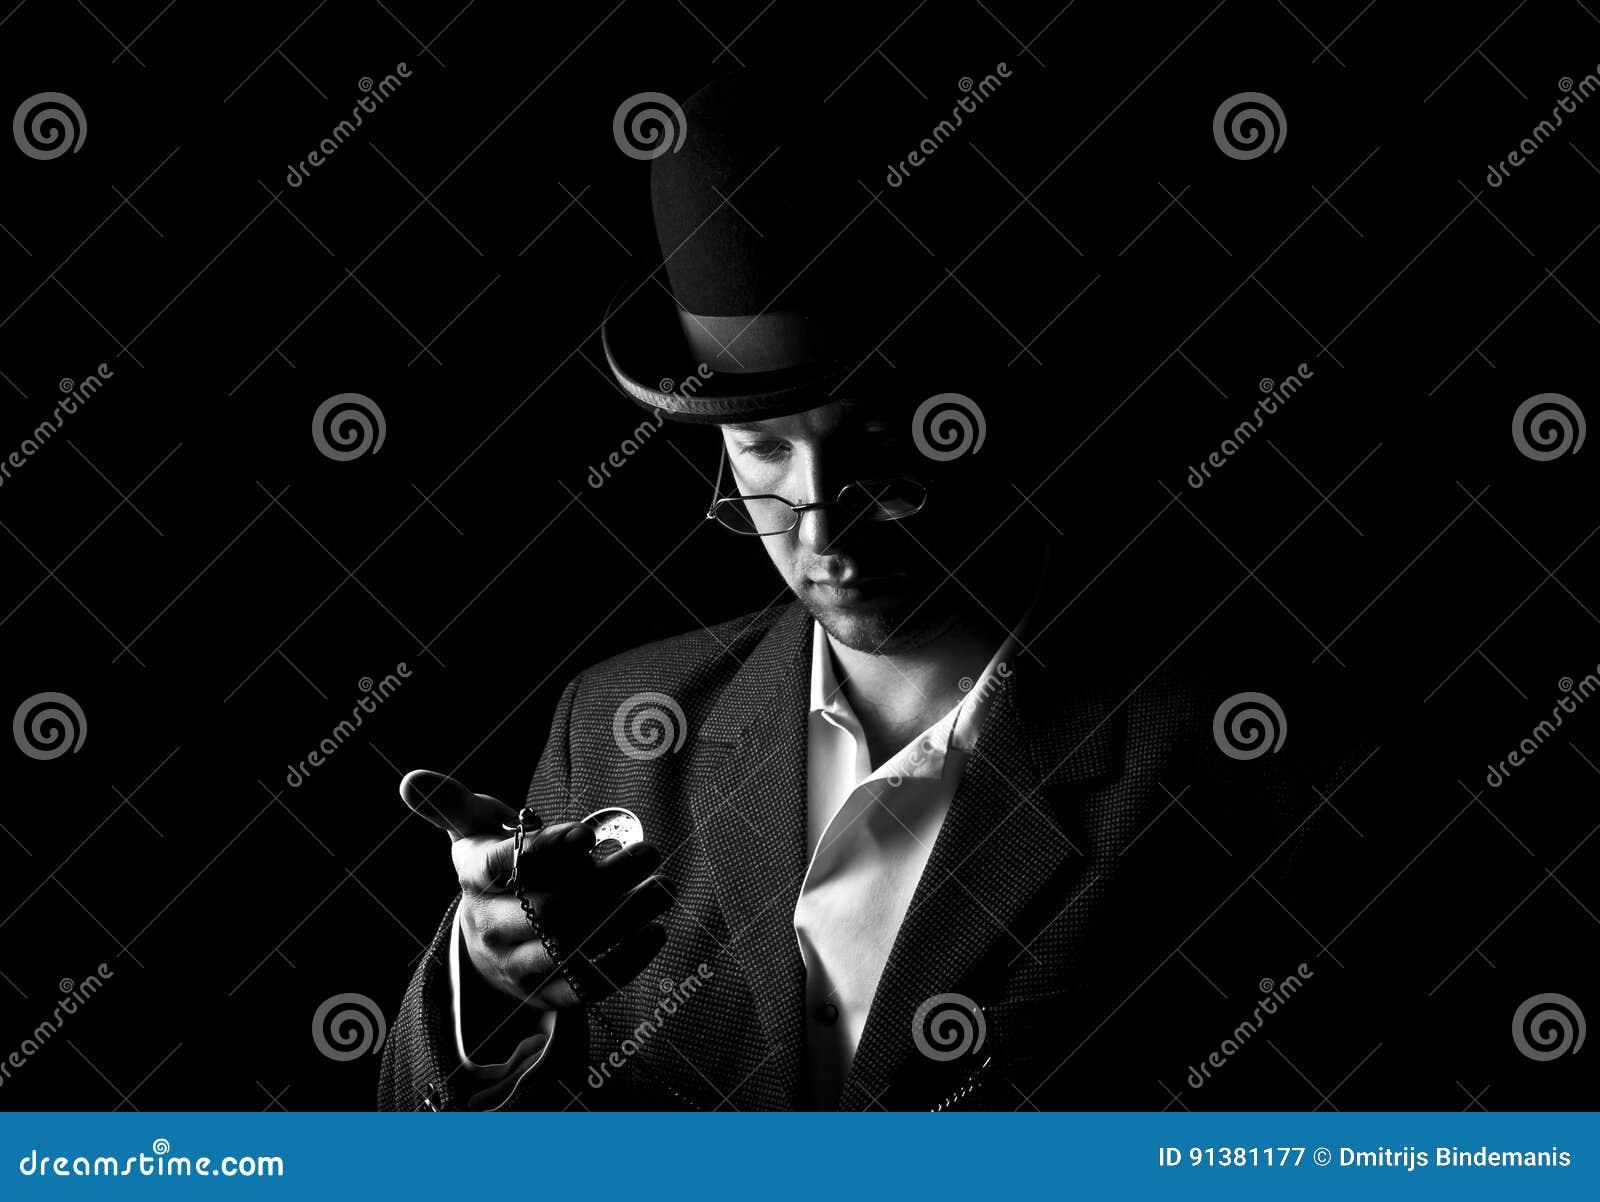 Открытка джентльмен снимает шляпу